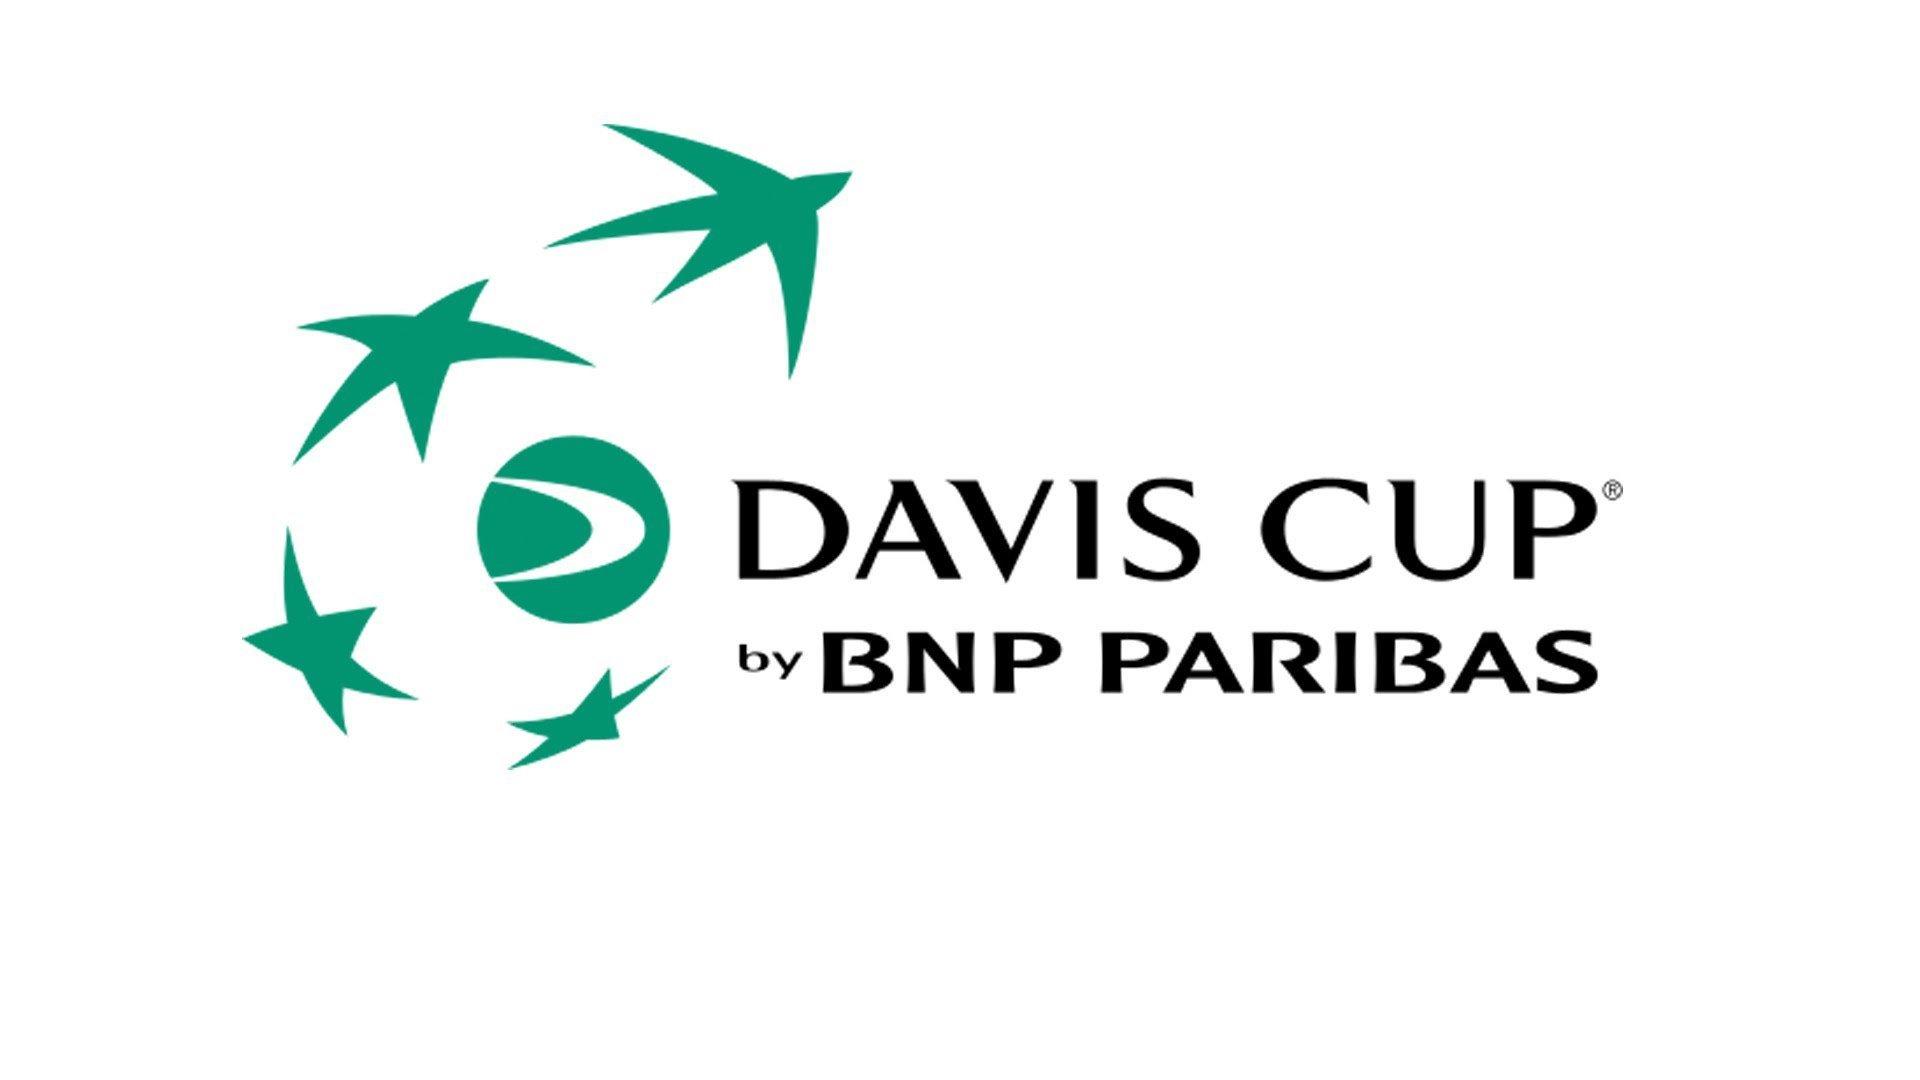 DavisCup-logo.jpg